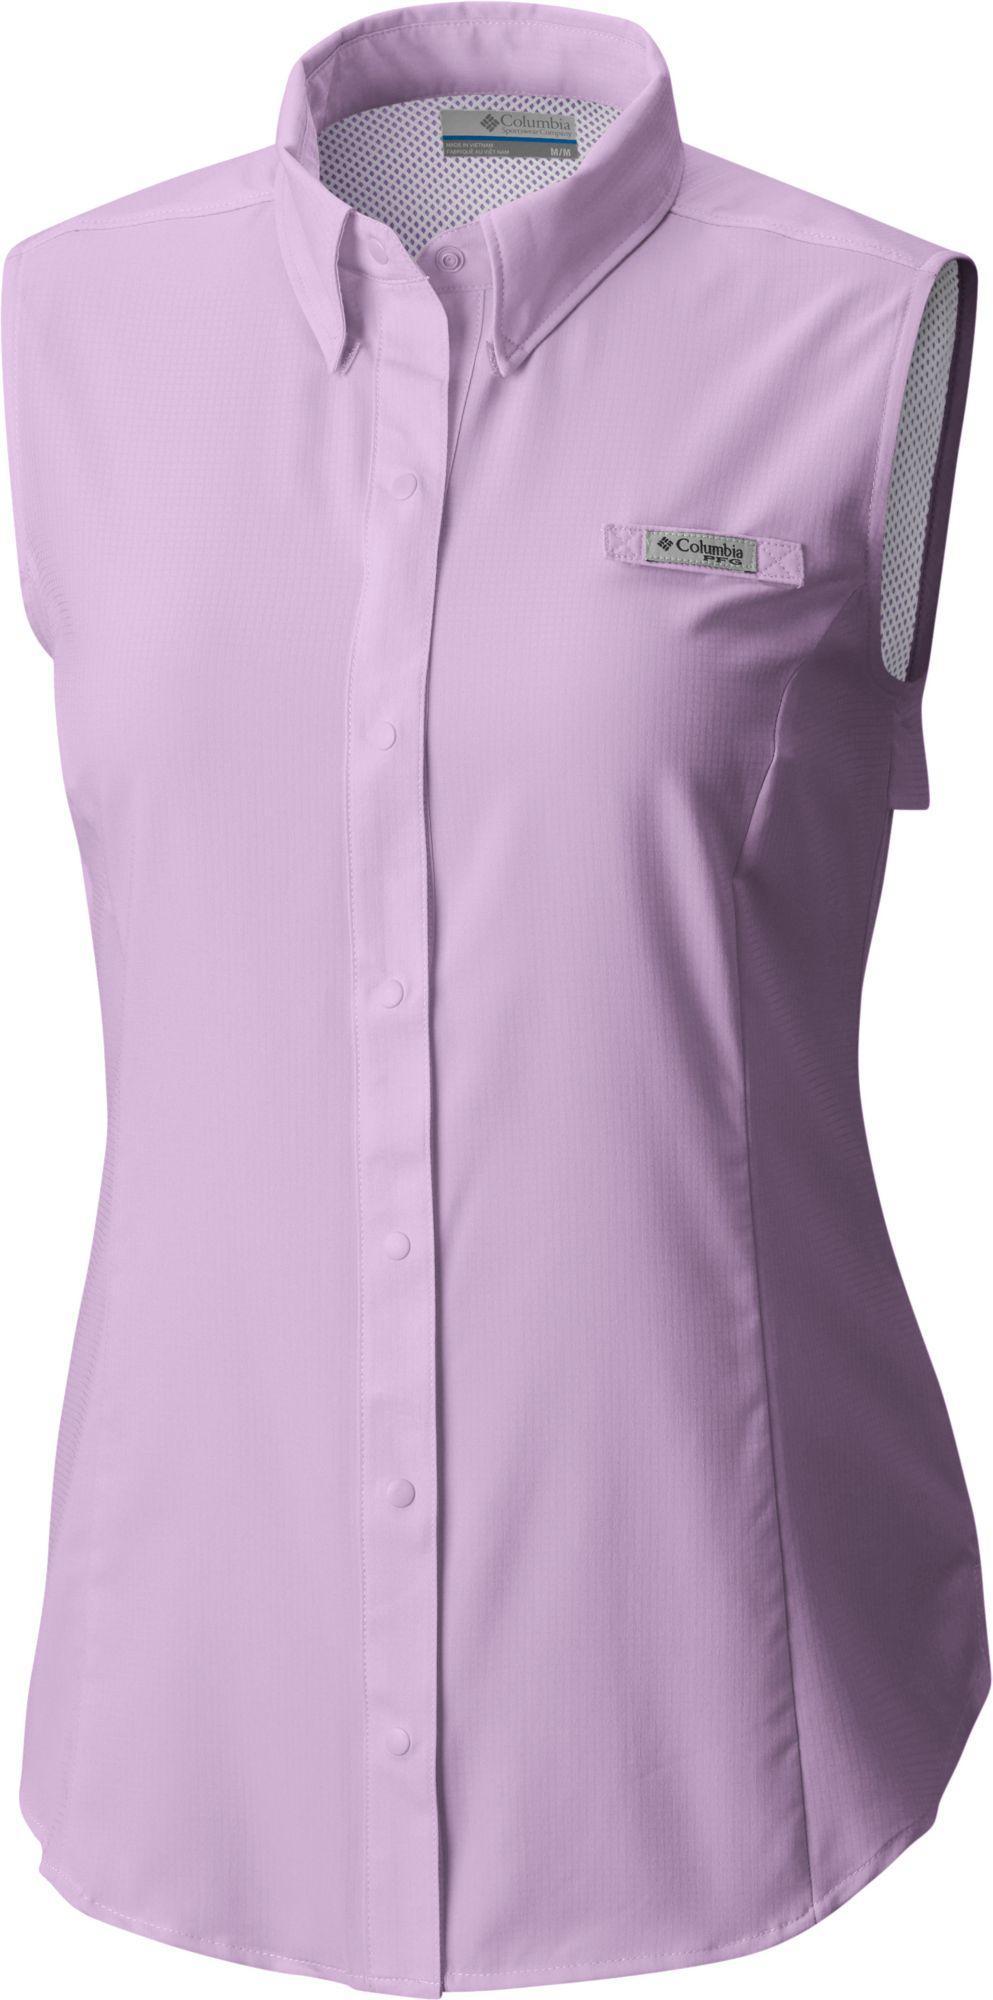 a33173535b19e6 Lyst - Columbia Pfg Tamiami Sleeveless Shirt in Purple